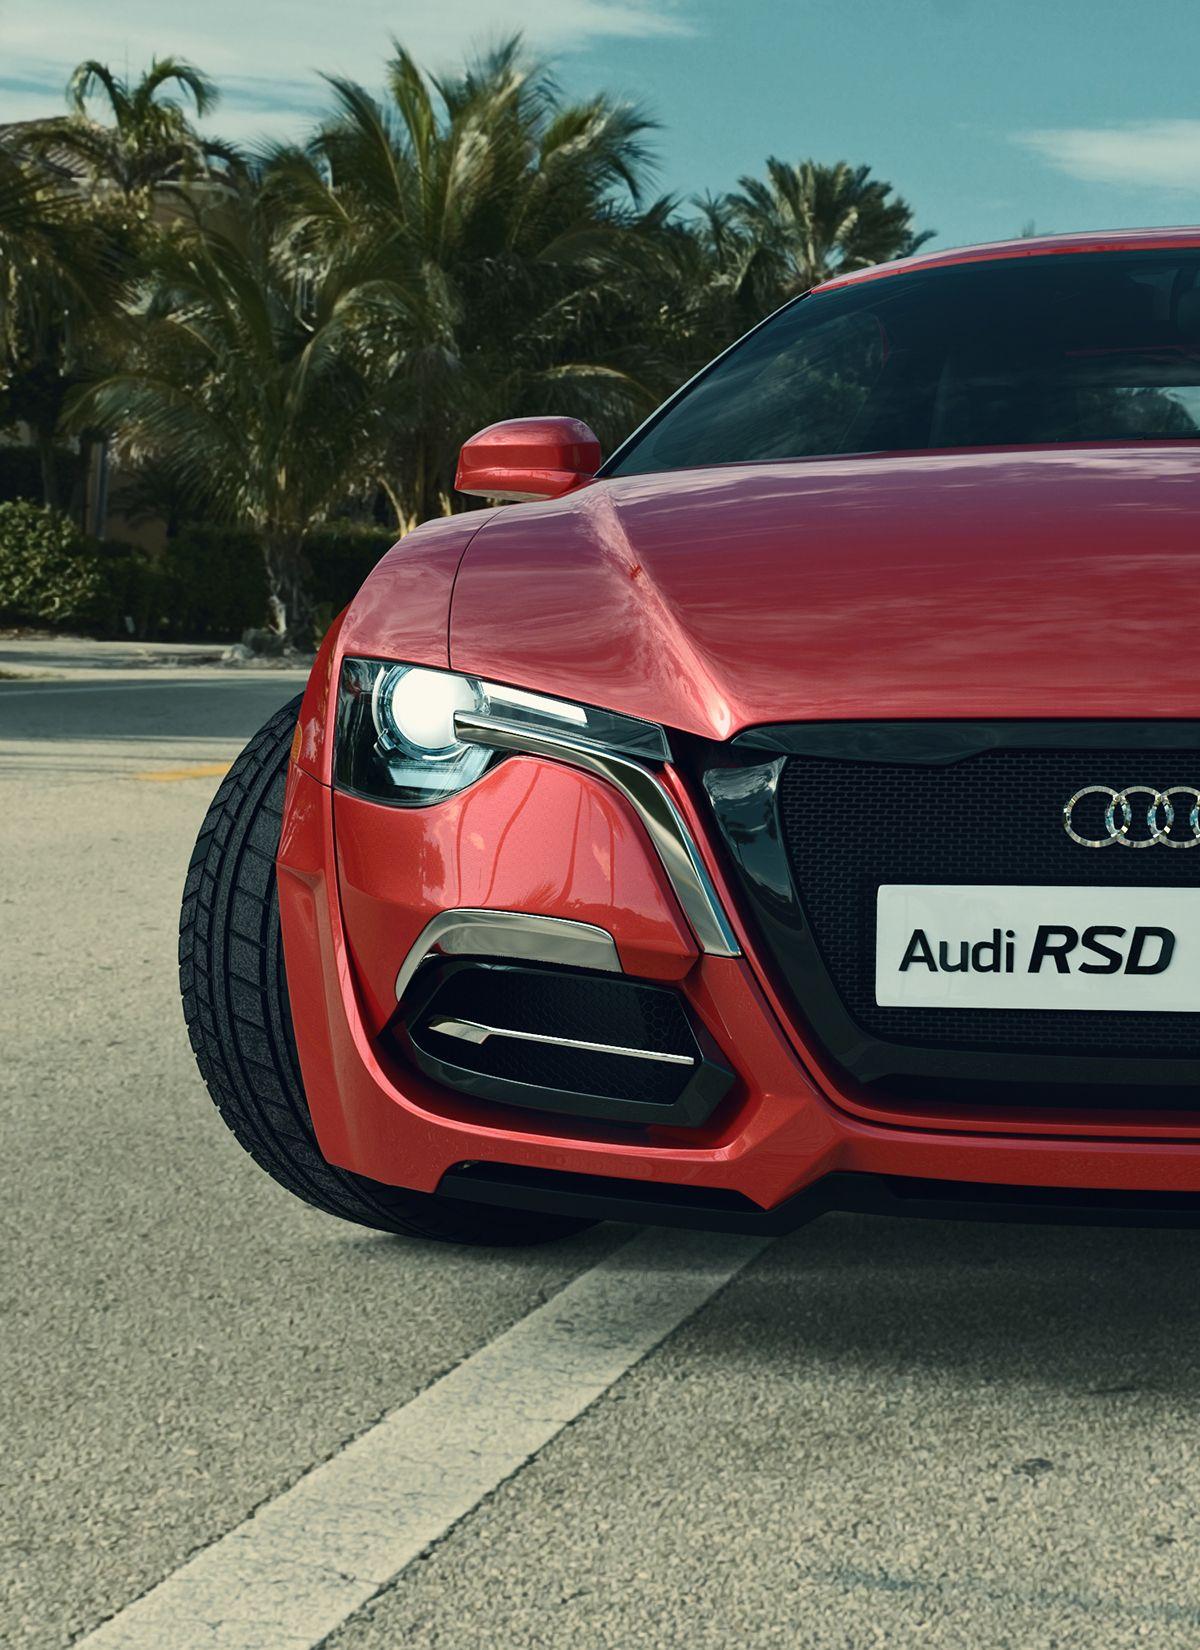 Photo of Audi RSD Concept